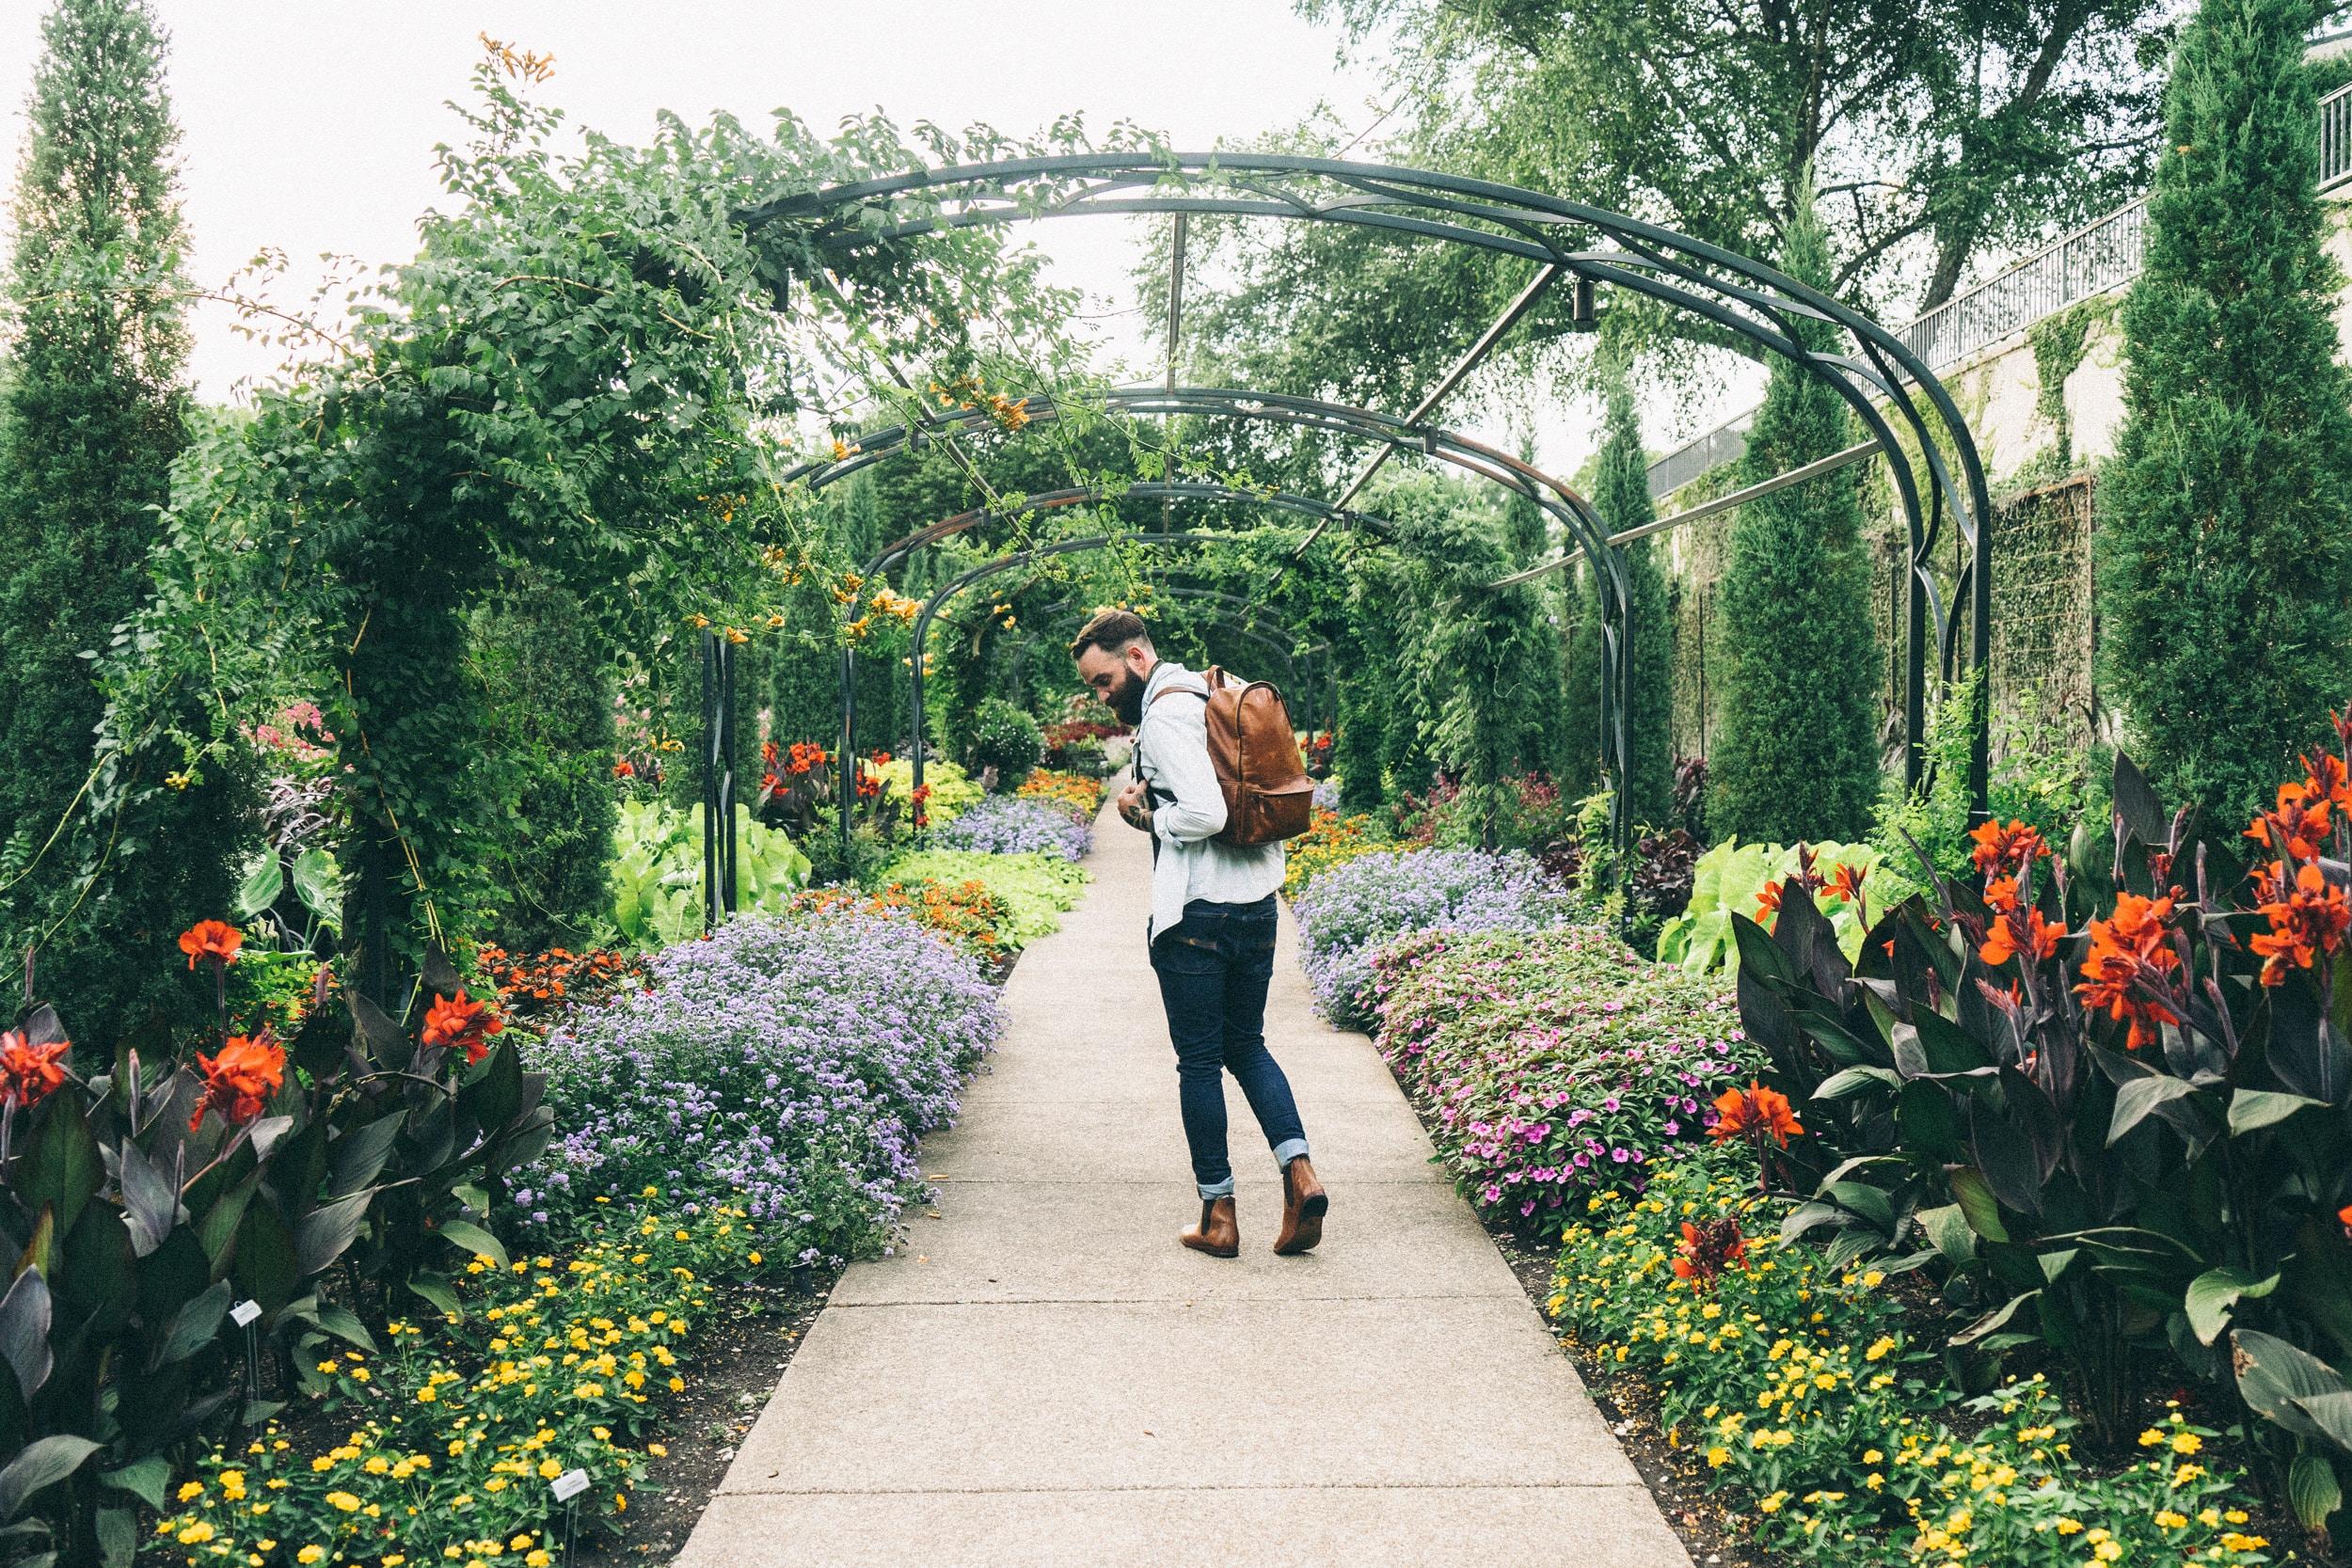 man carrying backpack walking on garden